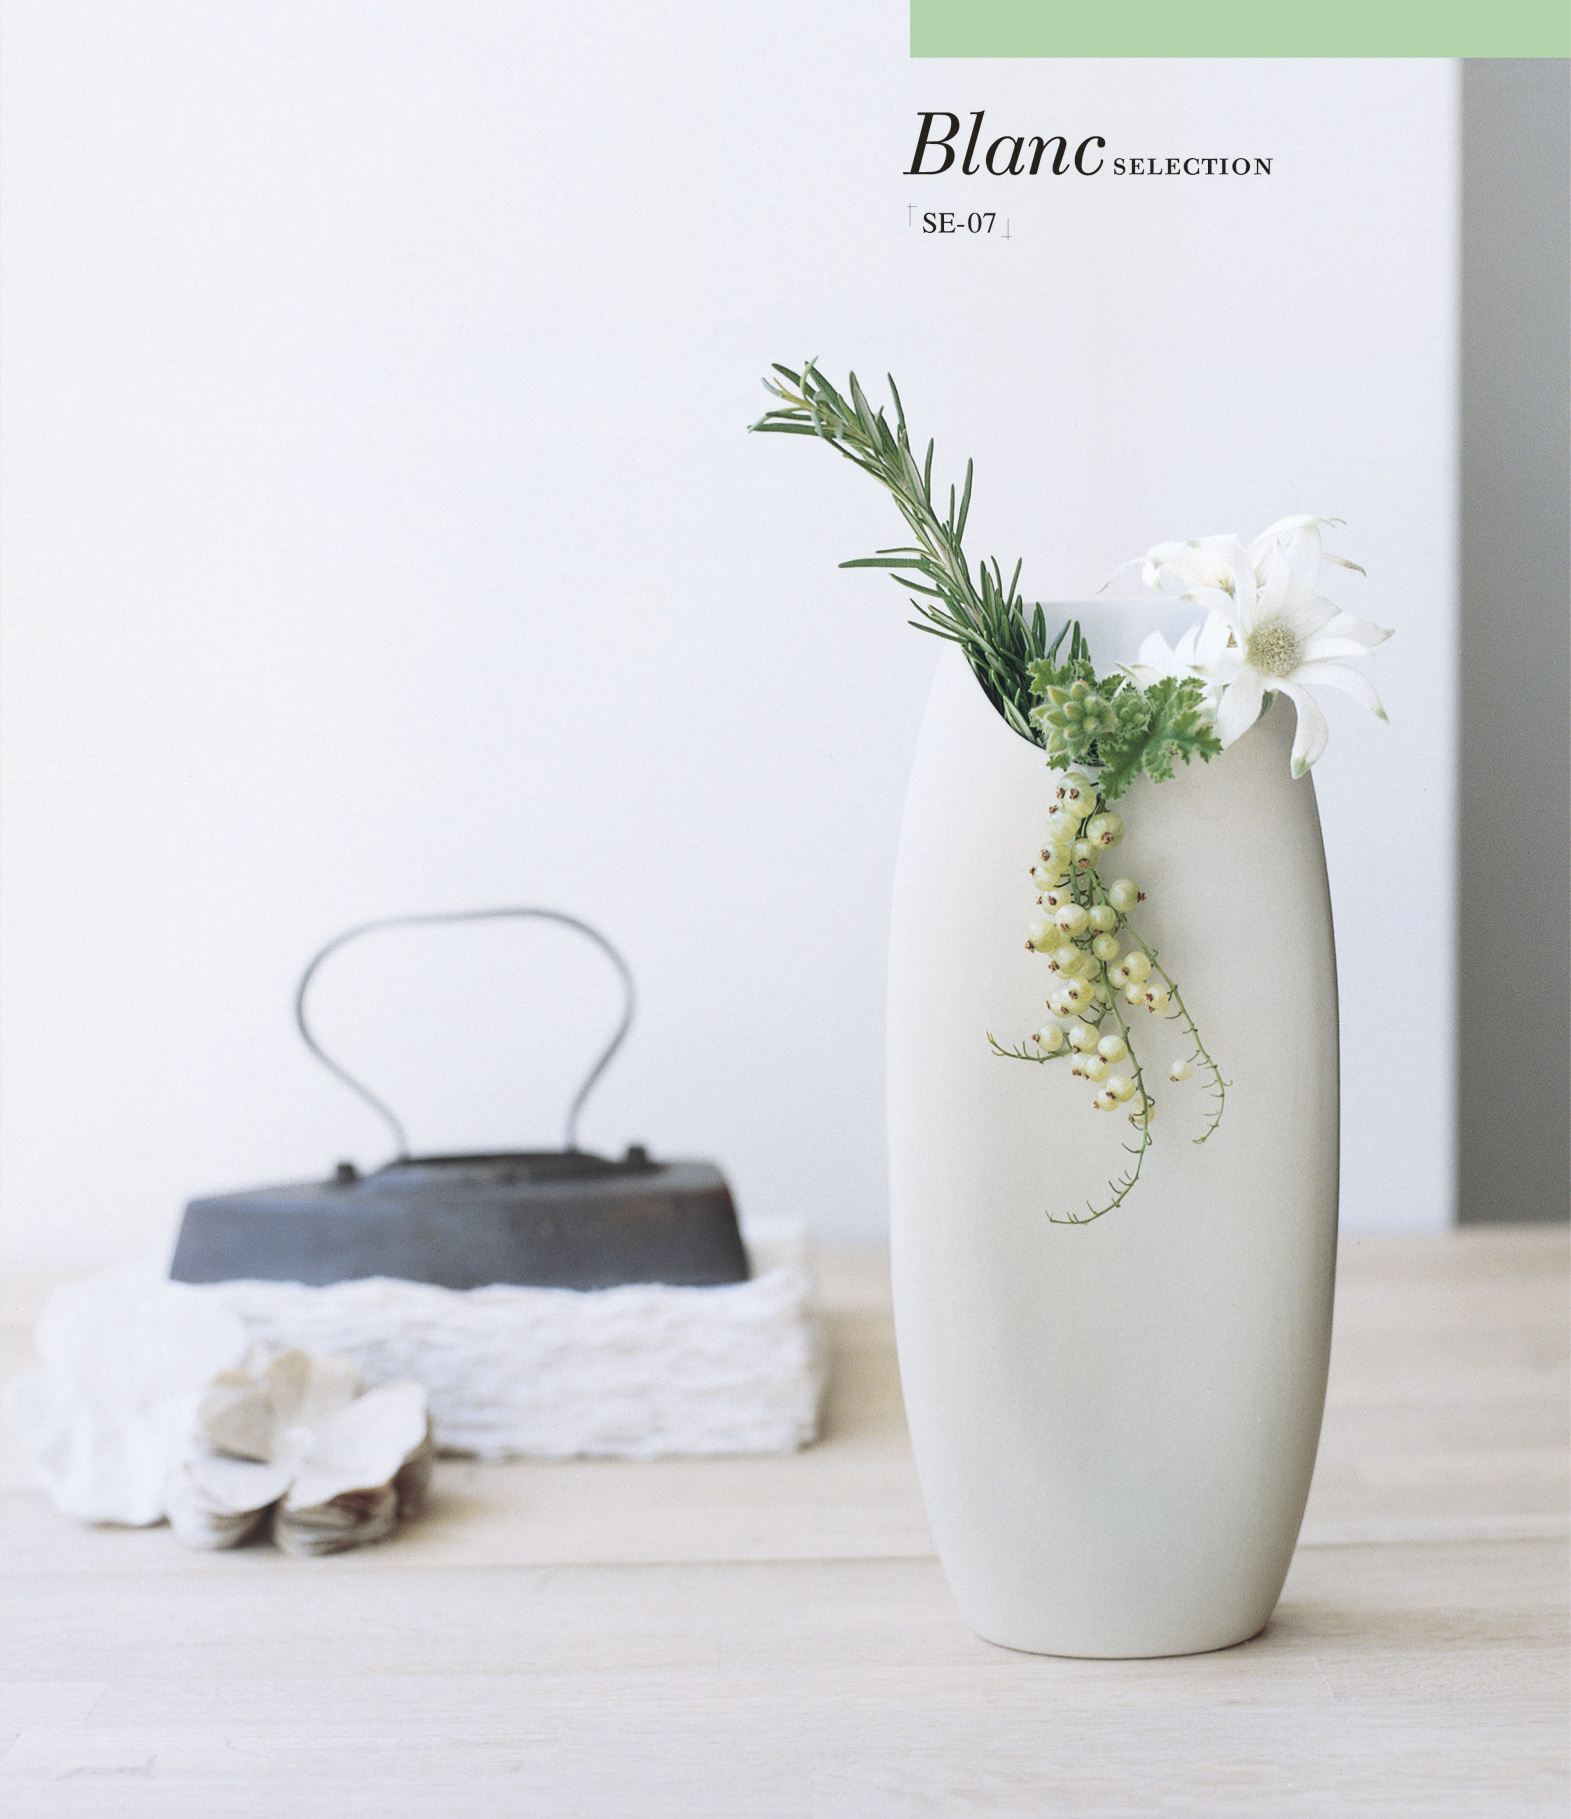 Blanc SE-07